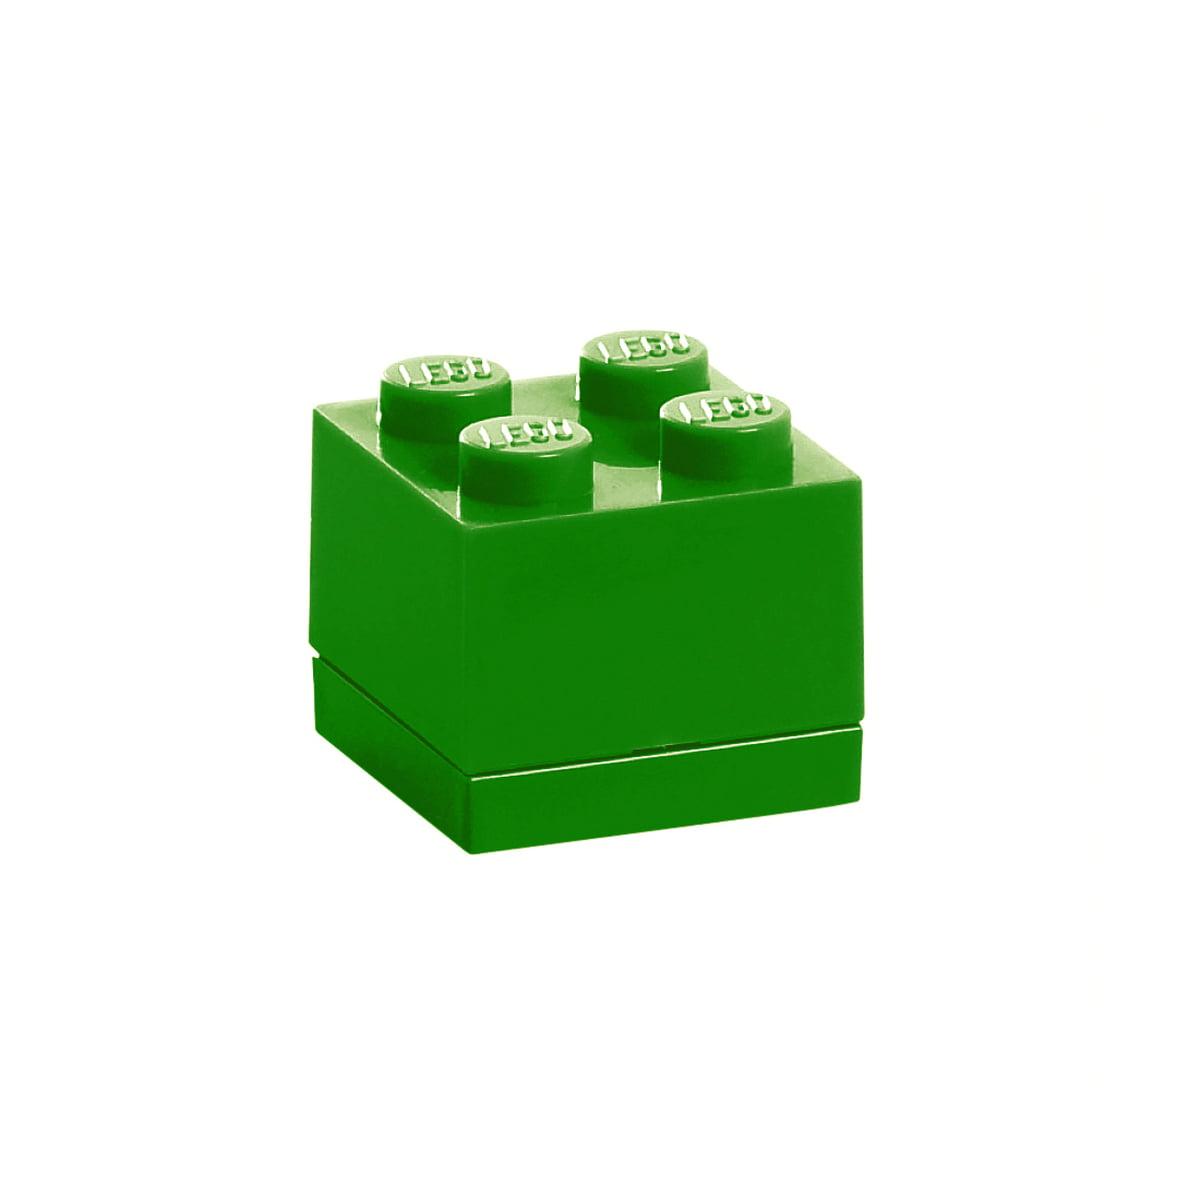 Lego - Mini-Box 4, dunkelgrün | Kinderzimmer > Spielzeuge > Sonstige Spielzeuge | Grün | Polypropylen | Lego